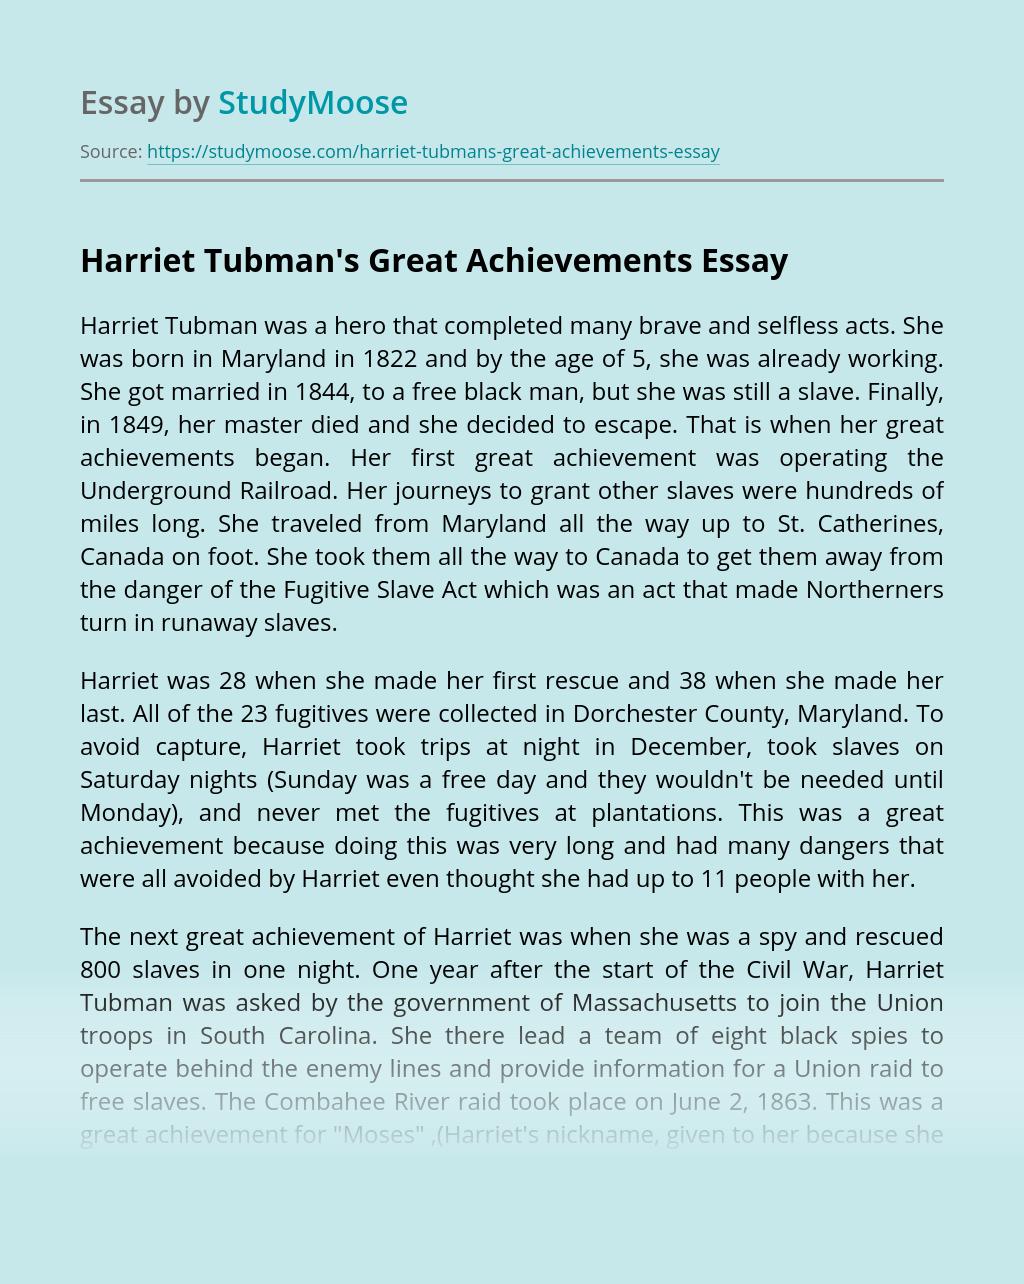 Harriet Tubman's Great Achievements